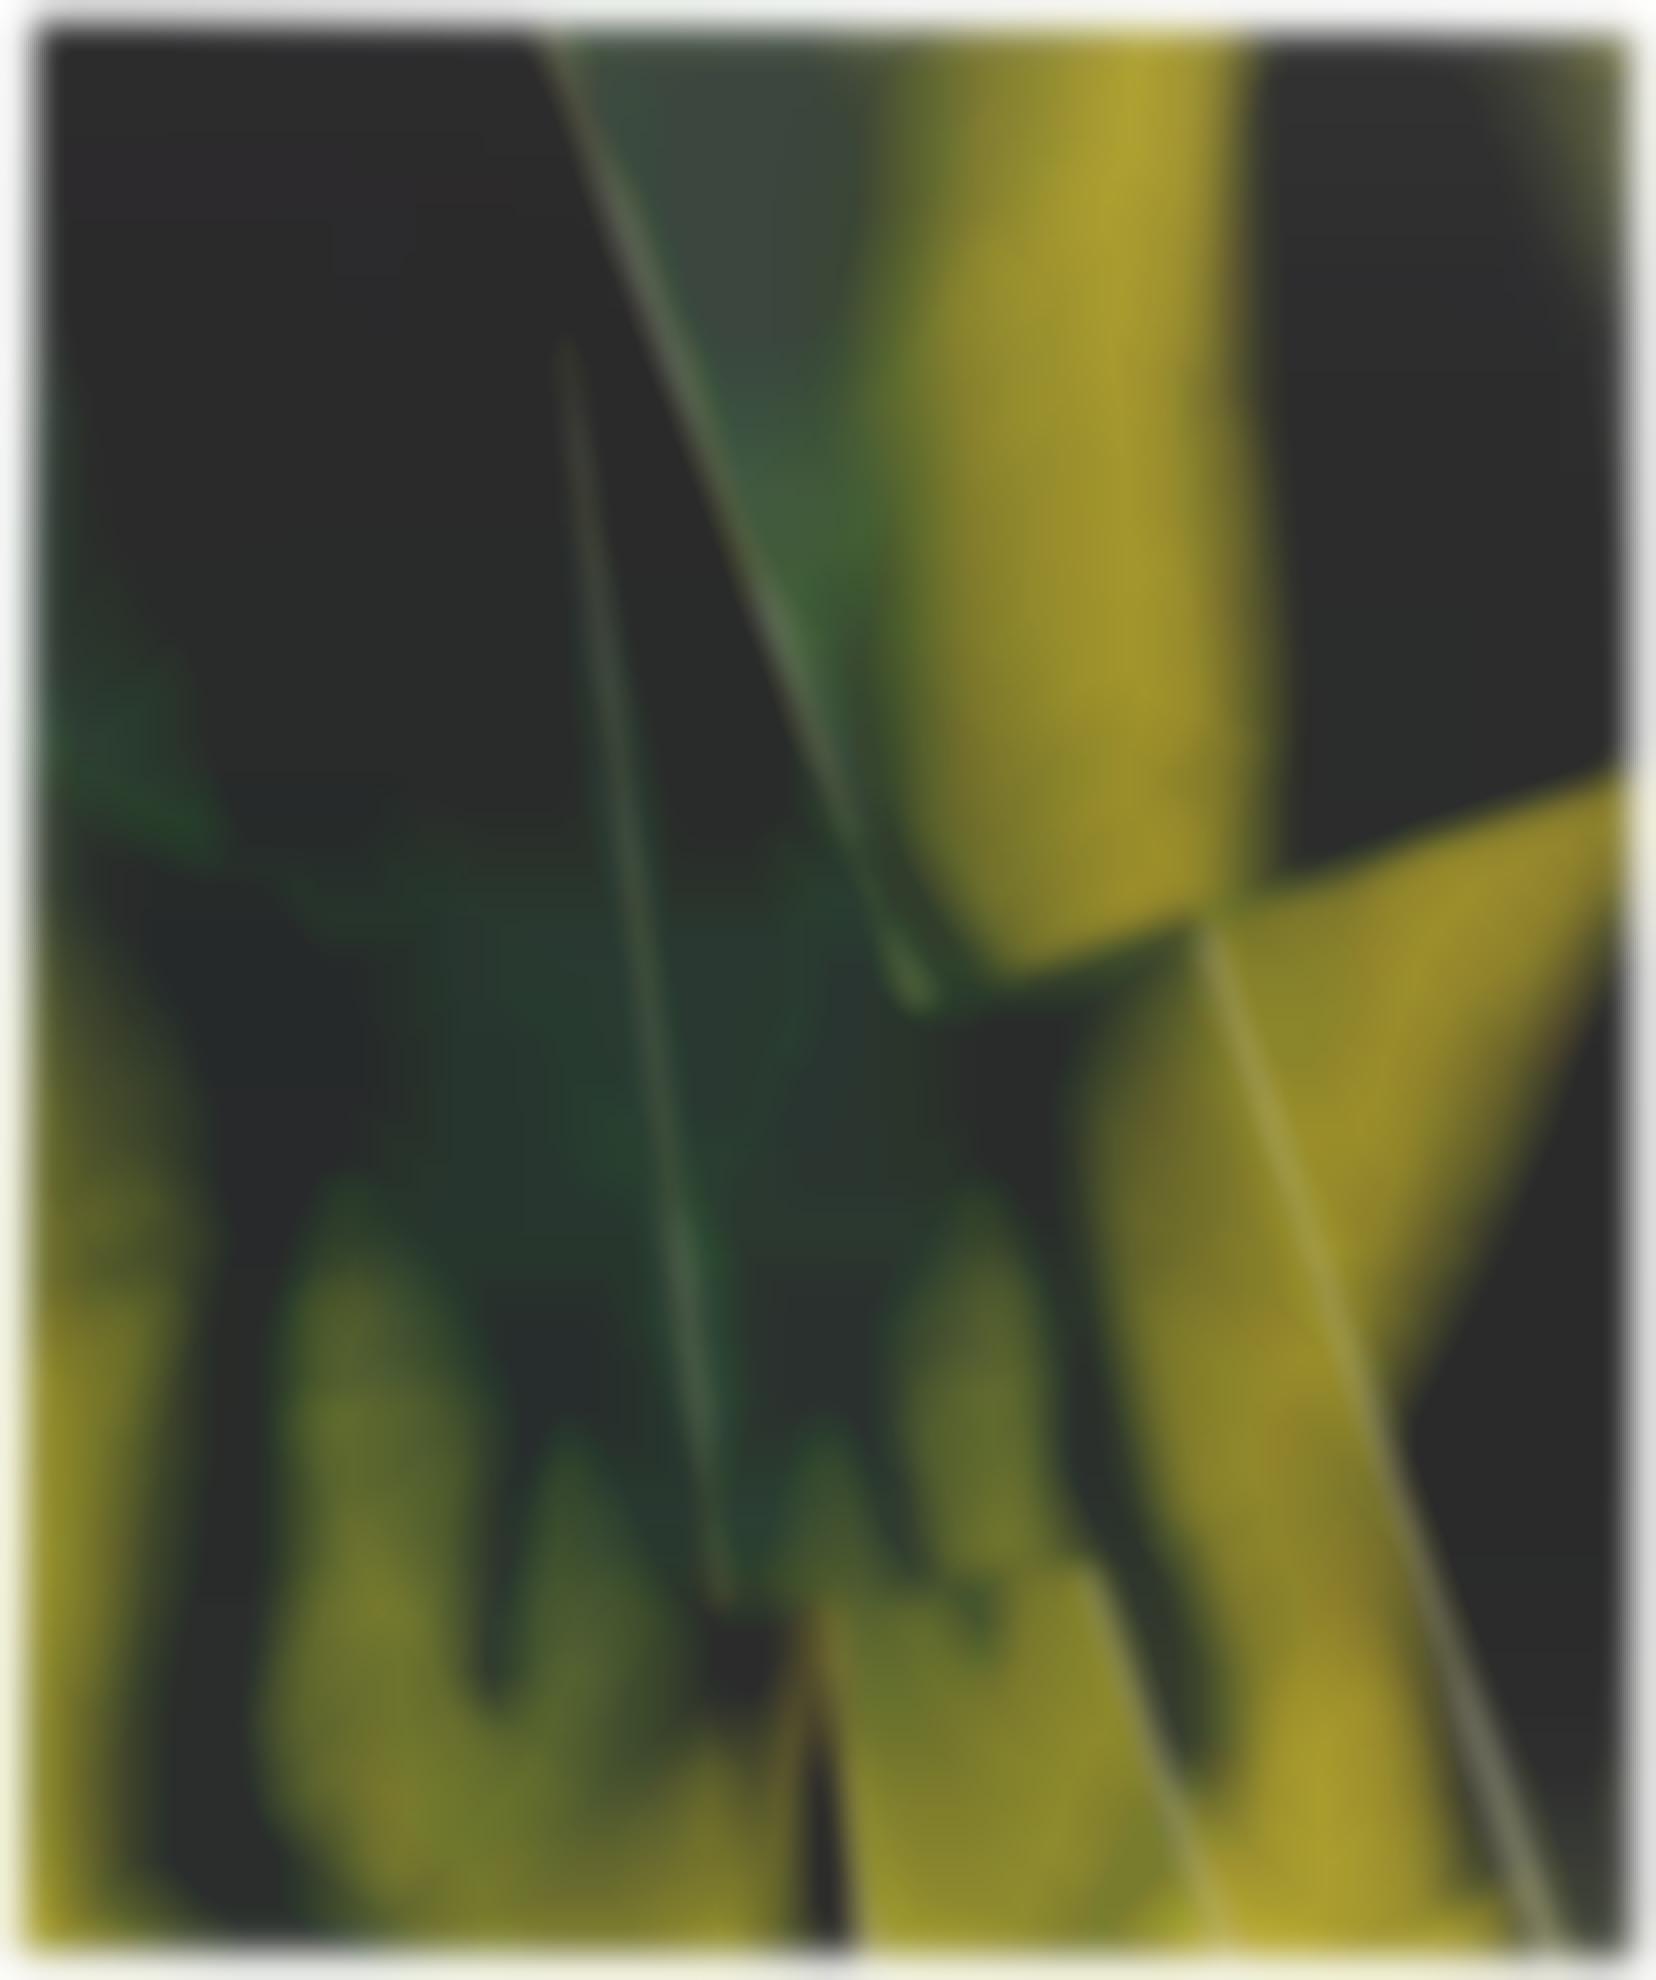 Eileen Quinlan-Smoke & Mirrors #99-2006